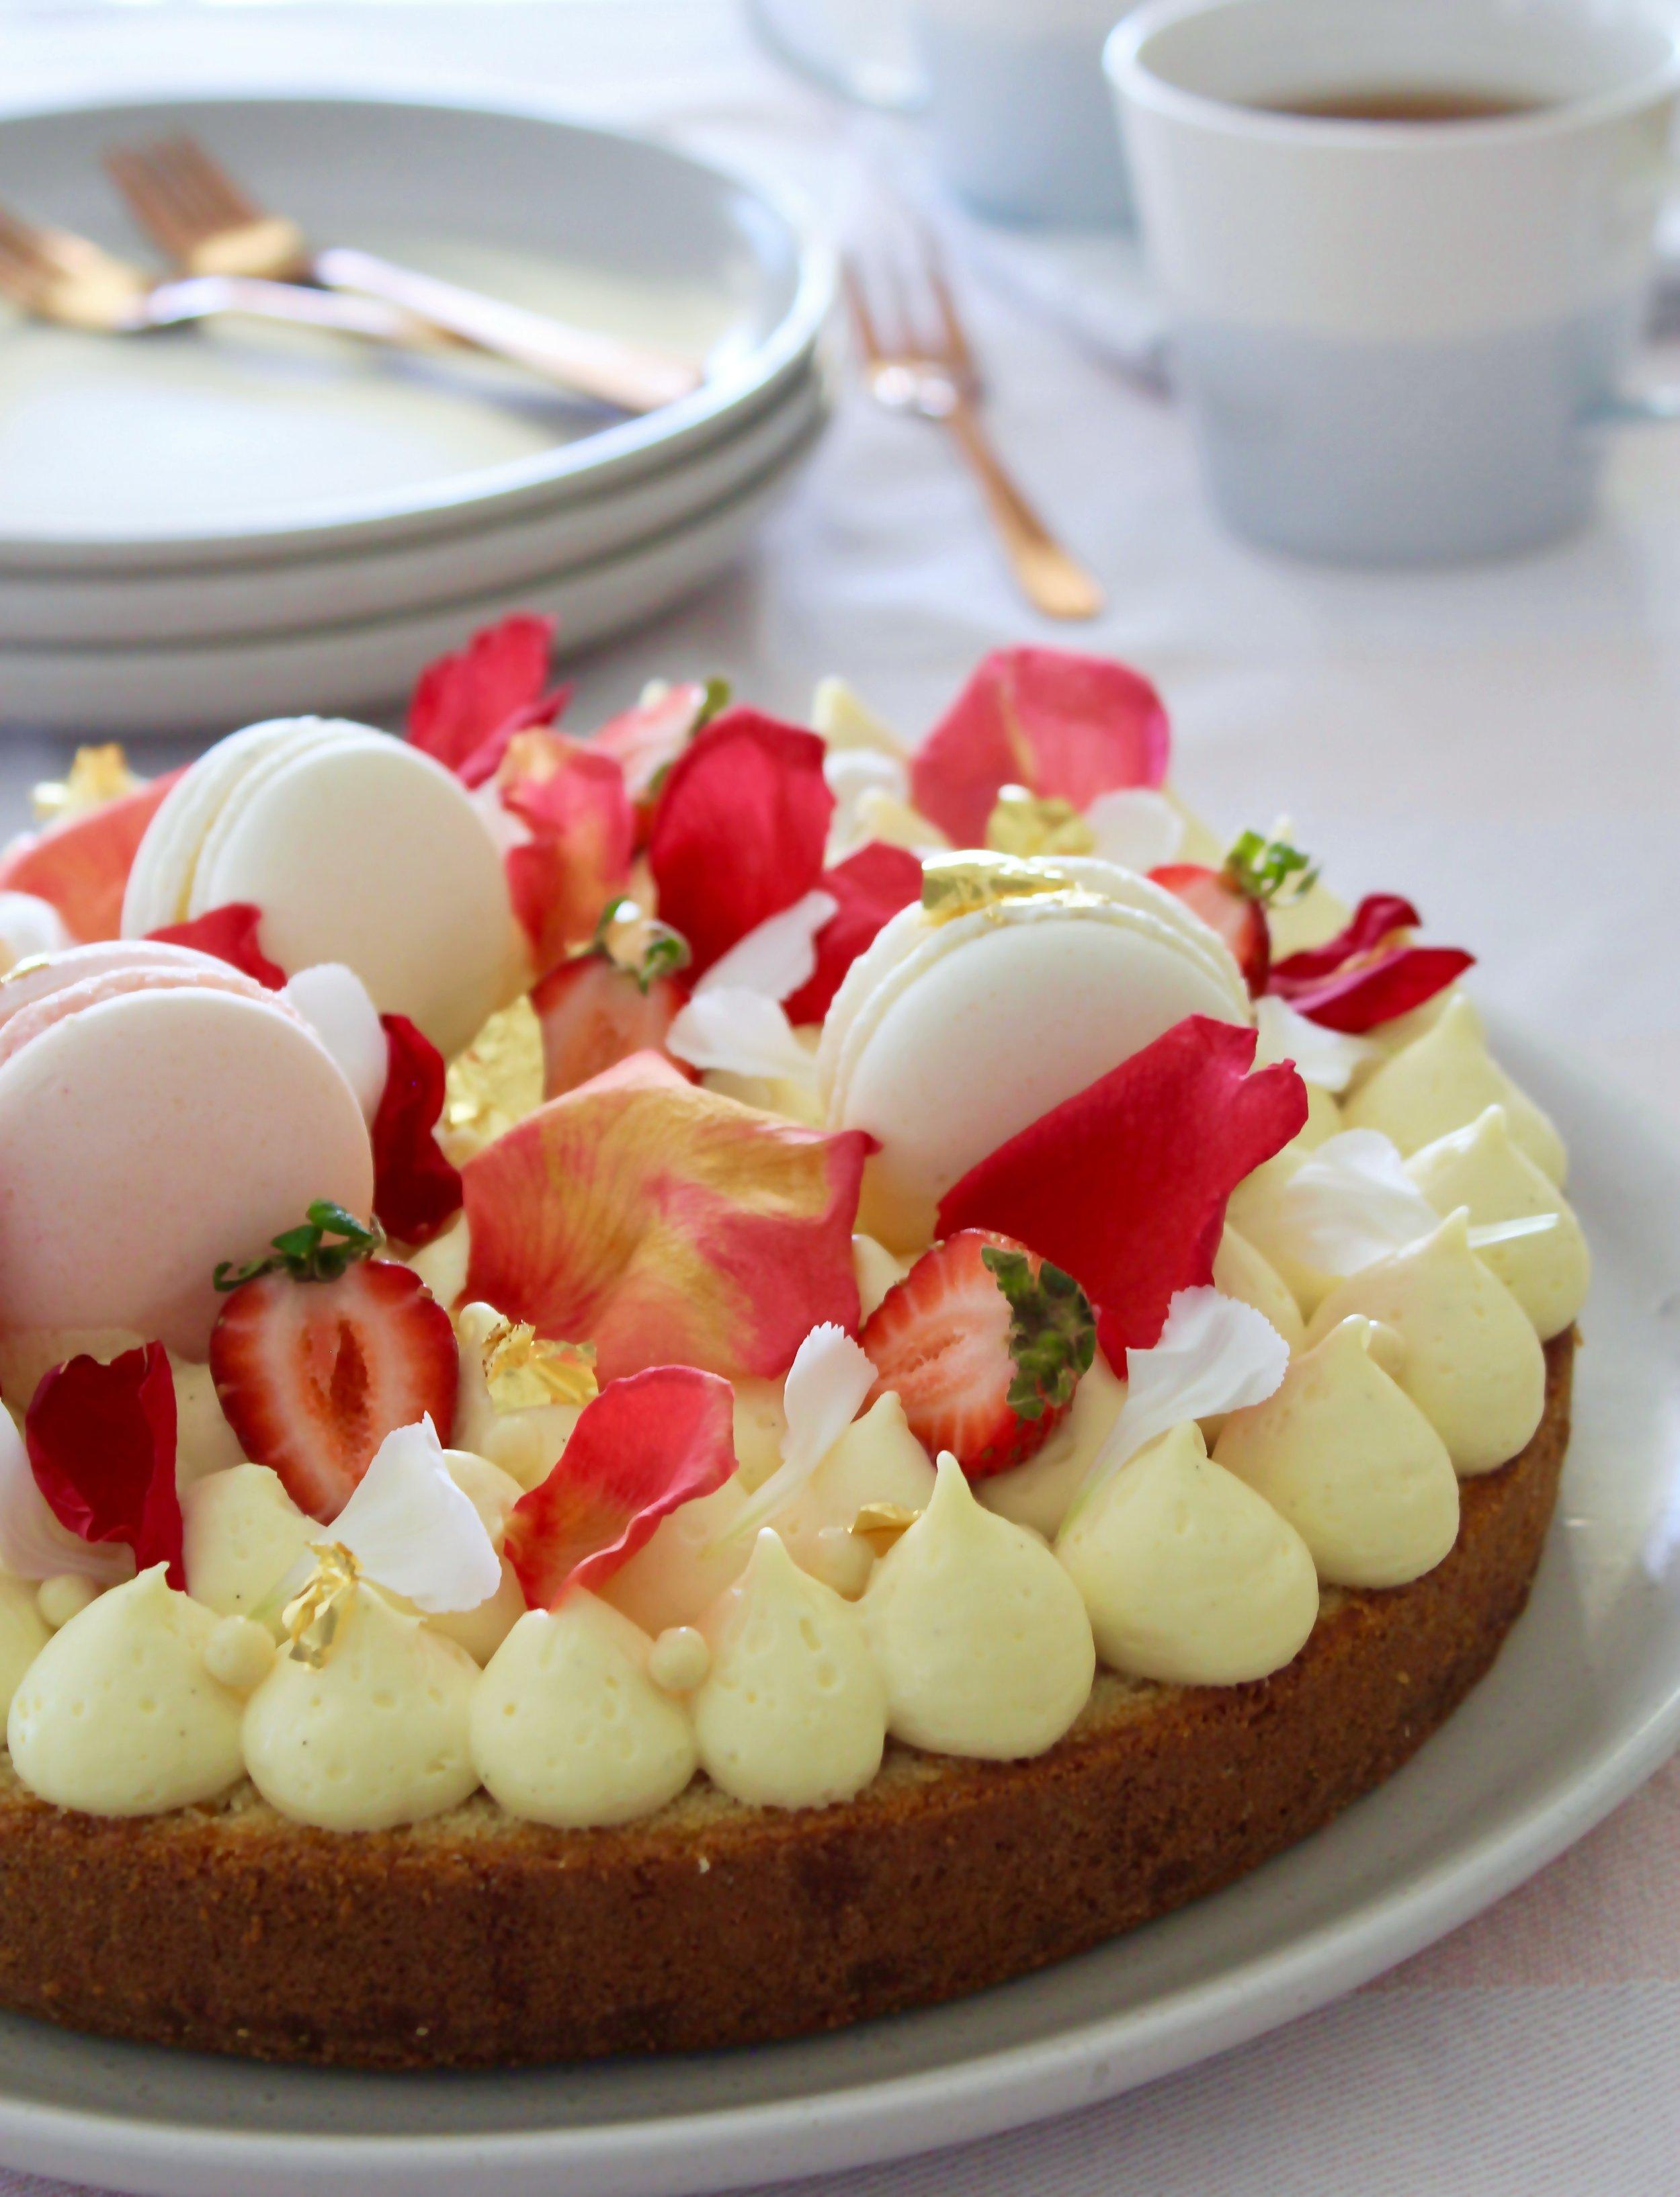 Cheesecake Mousse Strawberry Cake.jpg